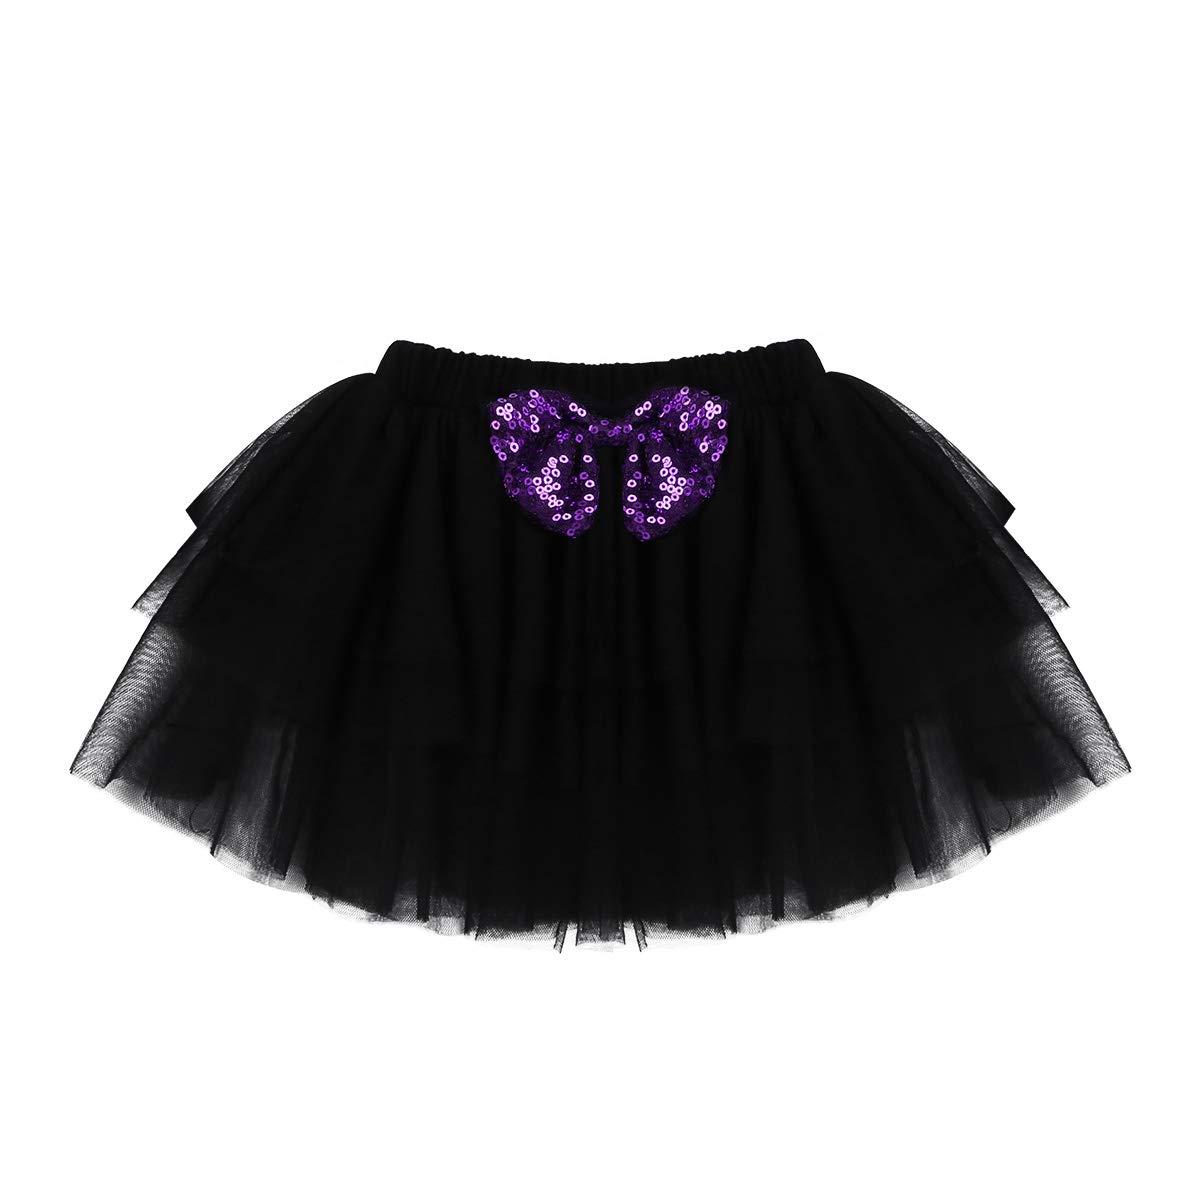 FEESHOW Baby Girls My 1st Halloween Outfit Costumes Romper Bodysuit Tutu Skirt Headband Set Black 5 pcs Set 0-3 Months by FEESHOW (Image #5)